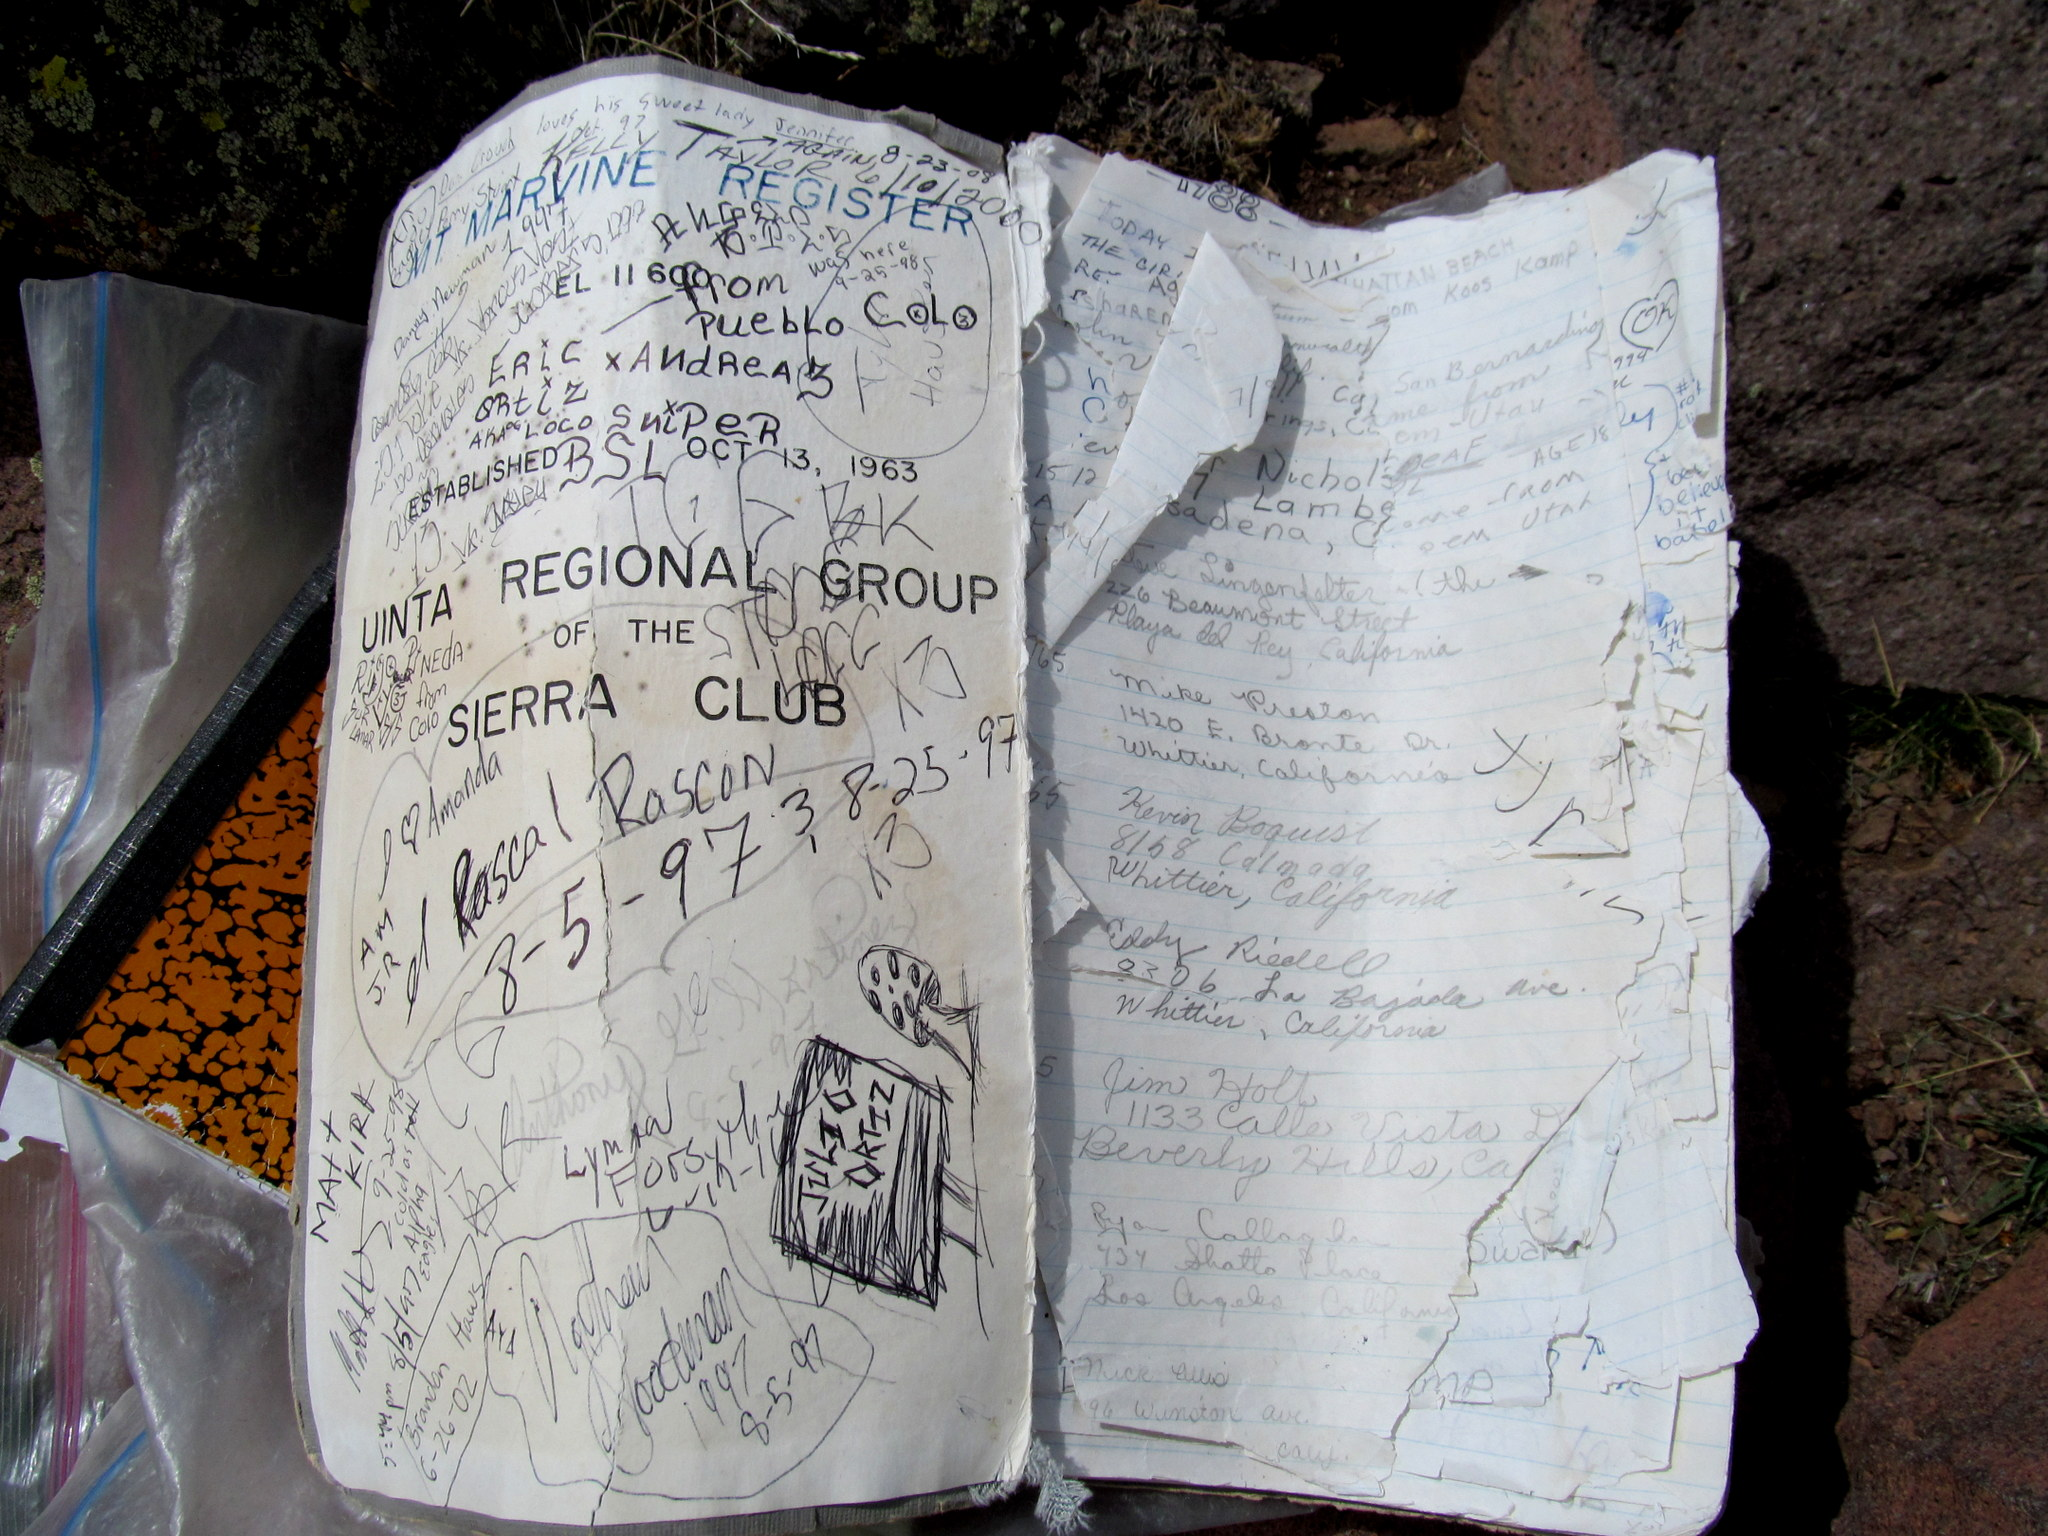 Photo: Sierra Club summit register from 1963